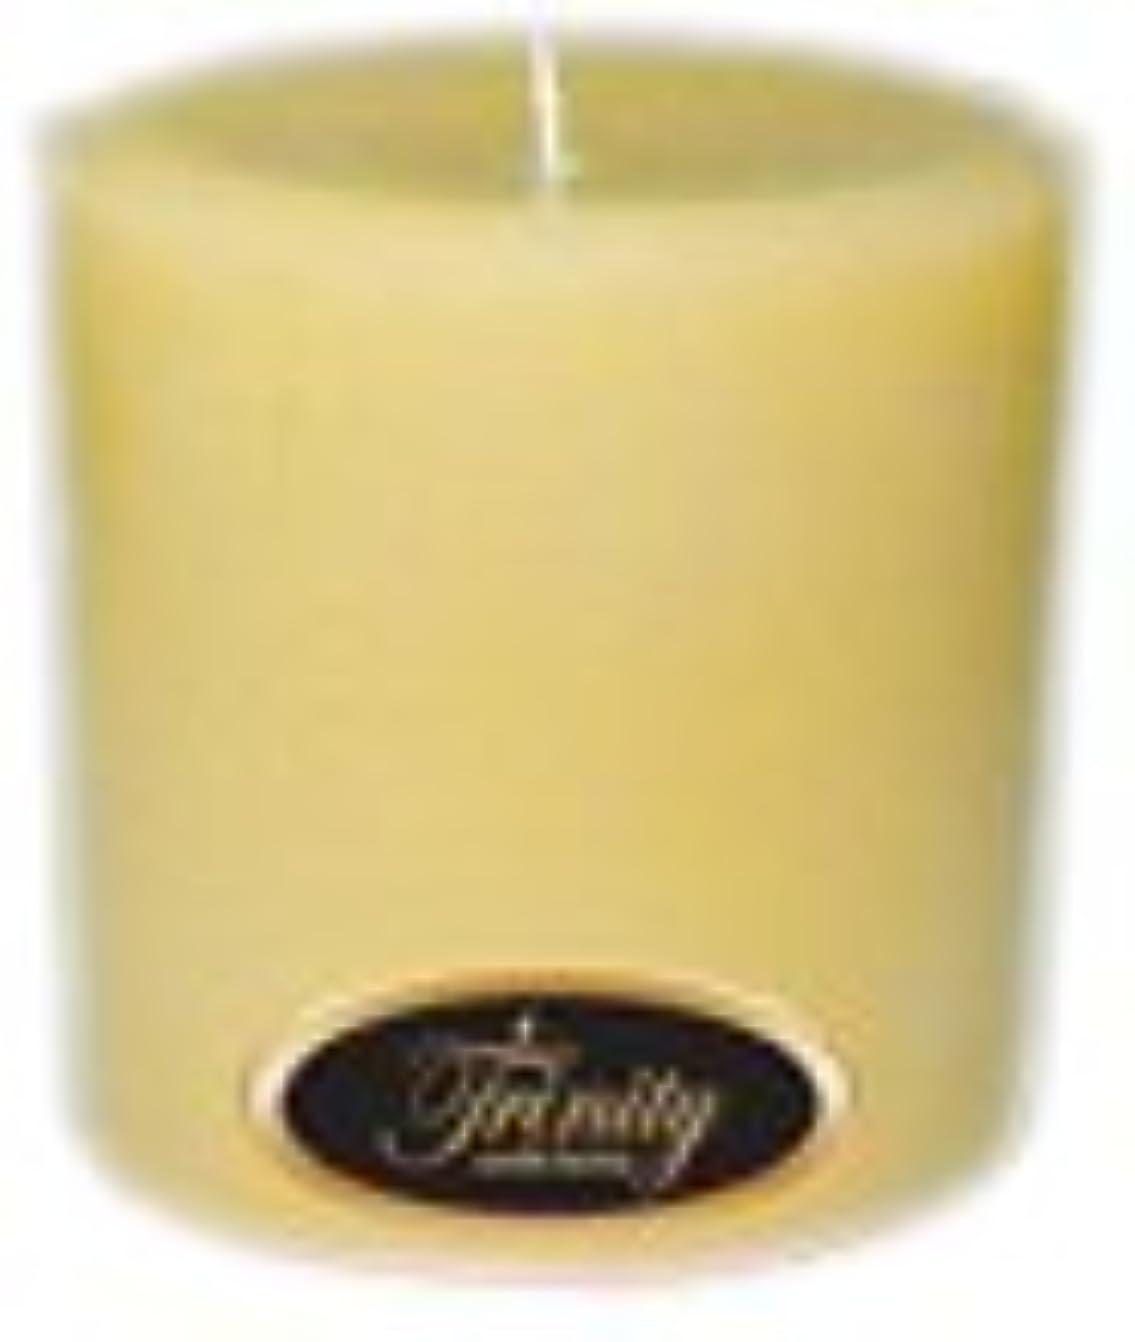 Trinity Candle工場 – クリーミーバニラ – Pillar Candle – 4 x 4